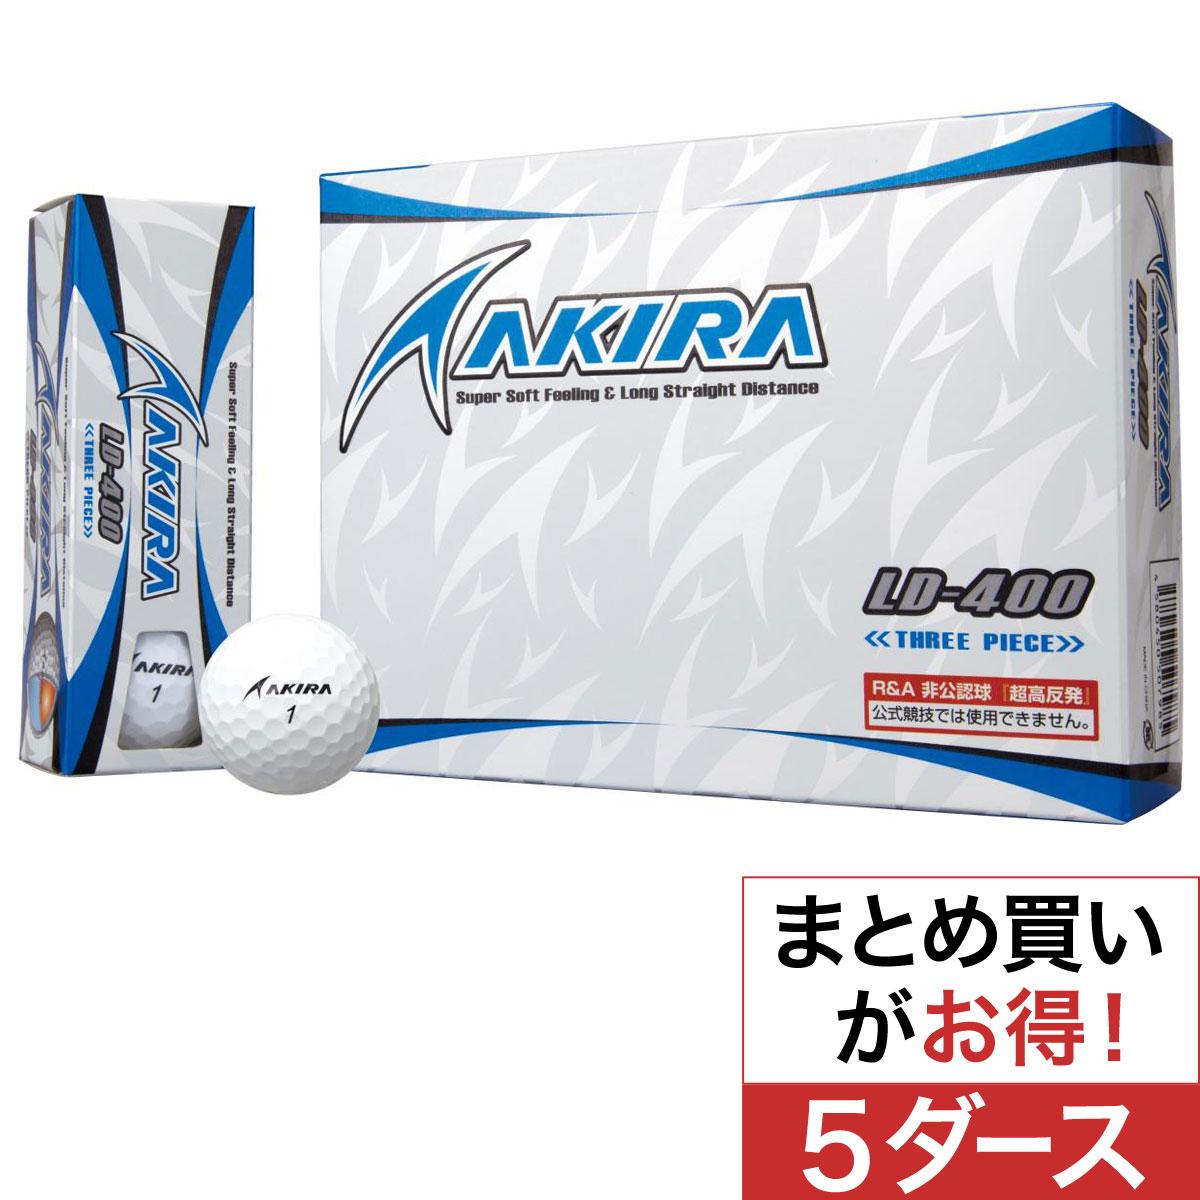 AKIRA LD-400 ボール 超高反発モデル 5ダースセット【非公認球】